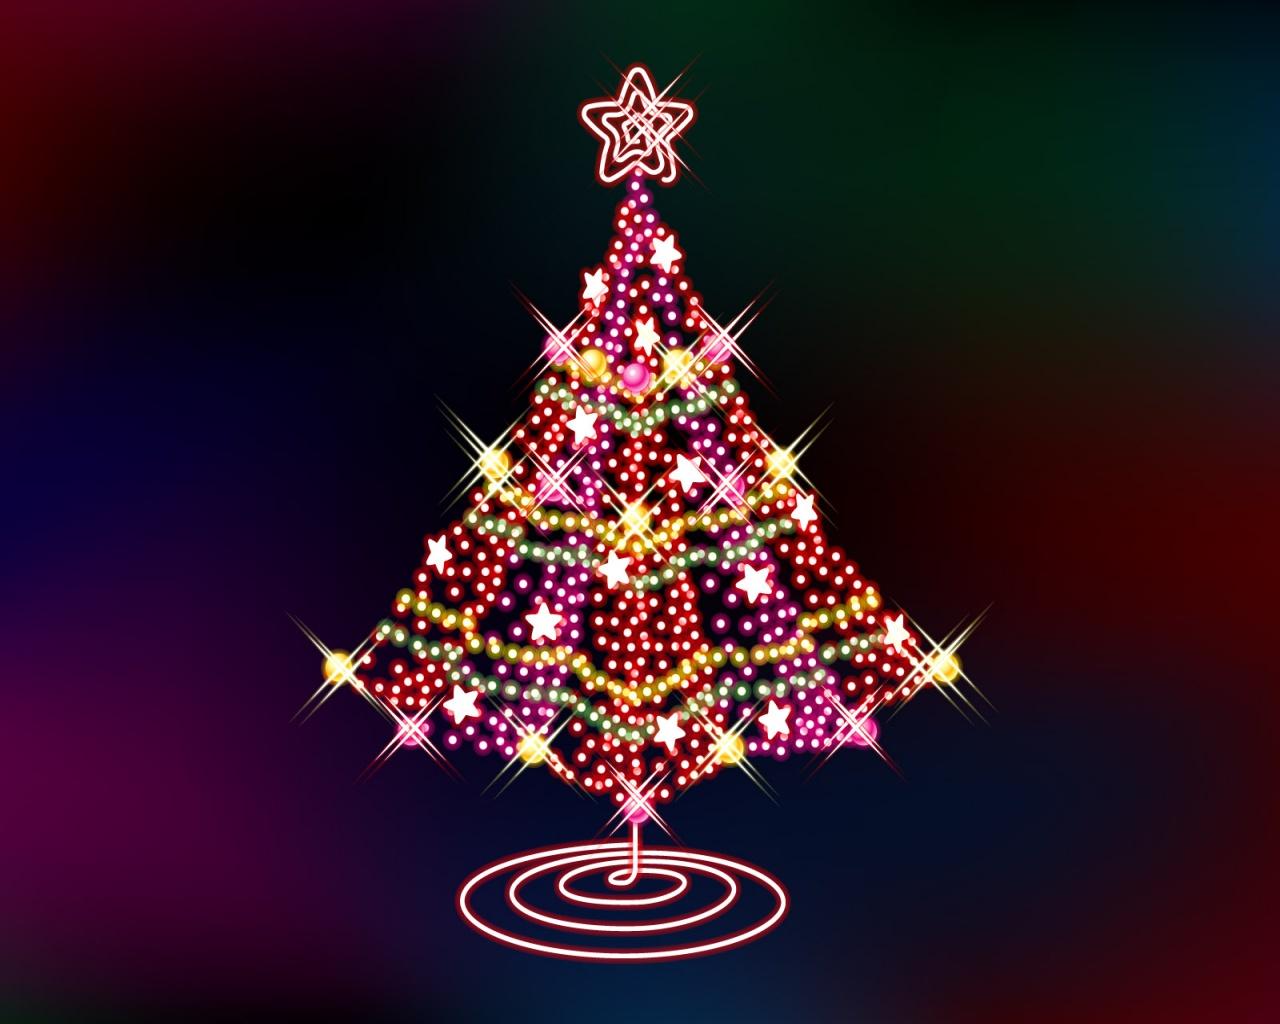 Fondos Pantalla Navidad Gratis